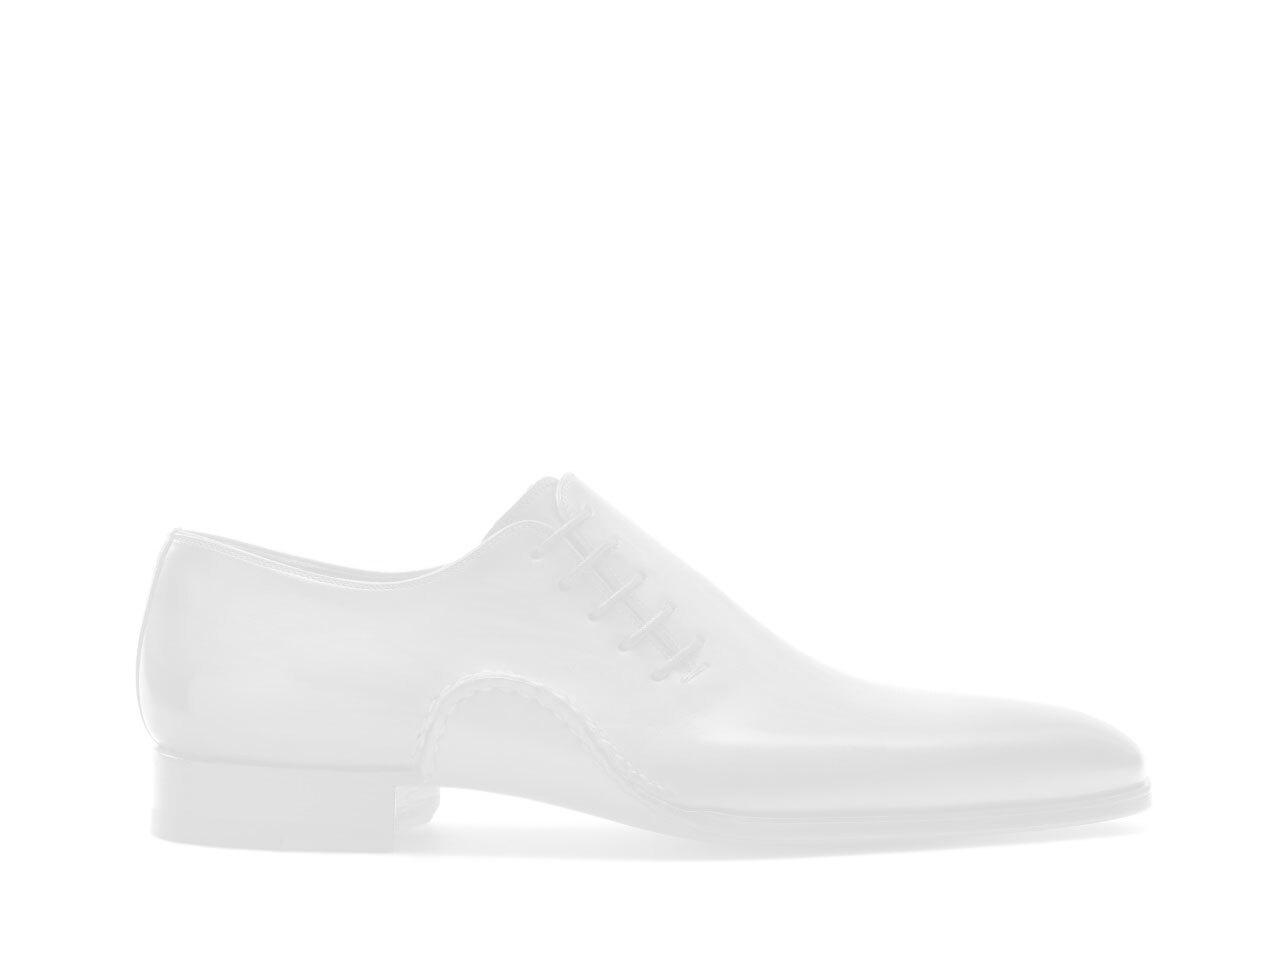 Side view of the Magnanni Avilés Navy Men's Double Monk Strap Shoes